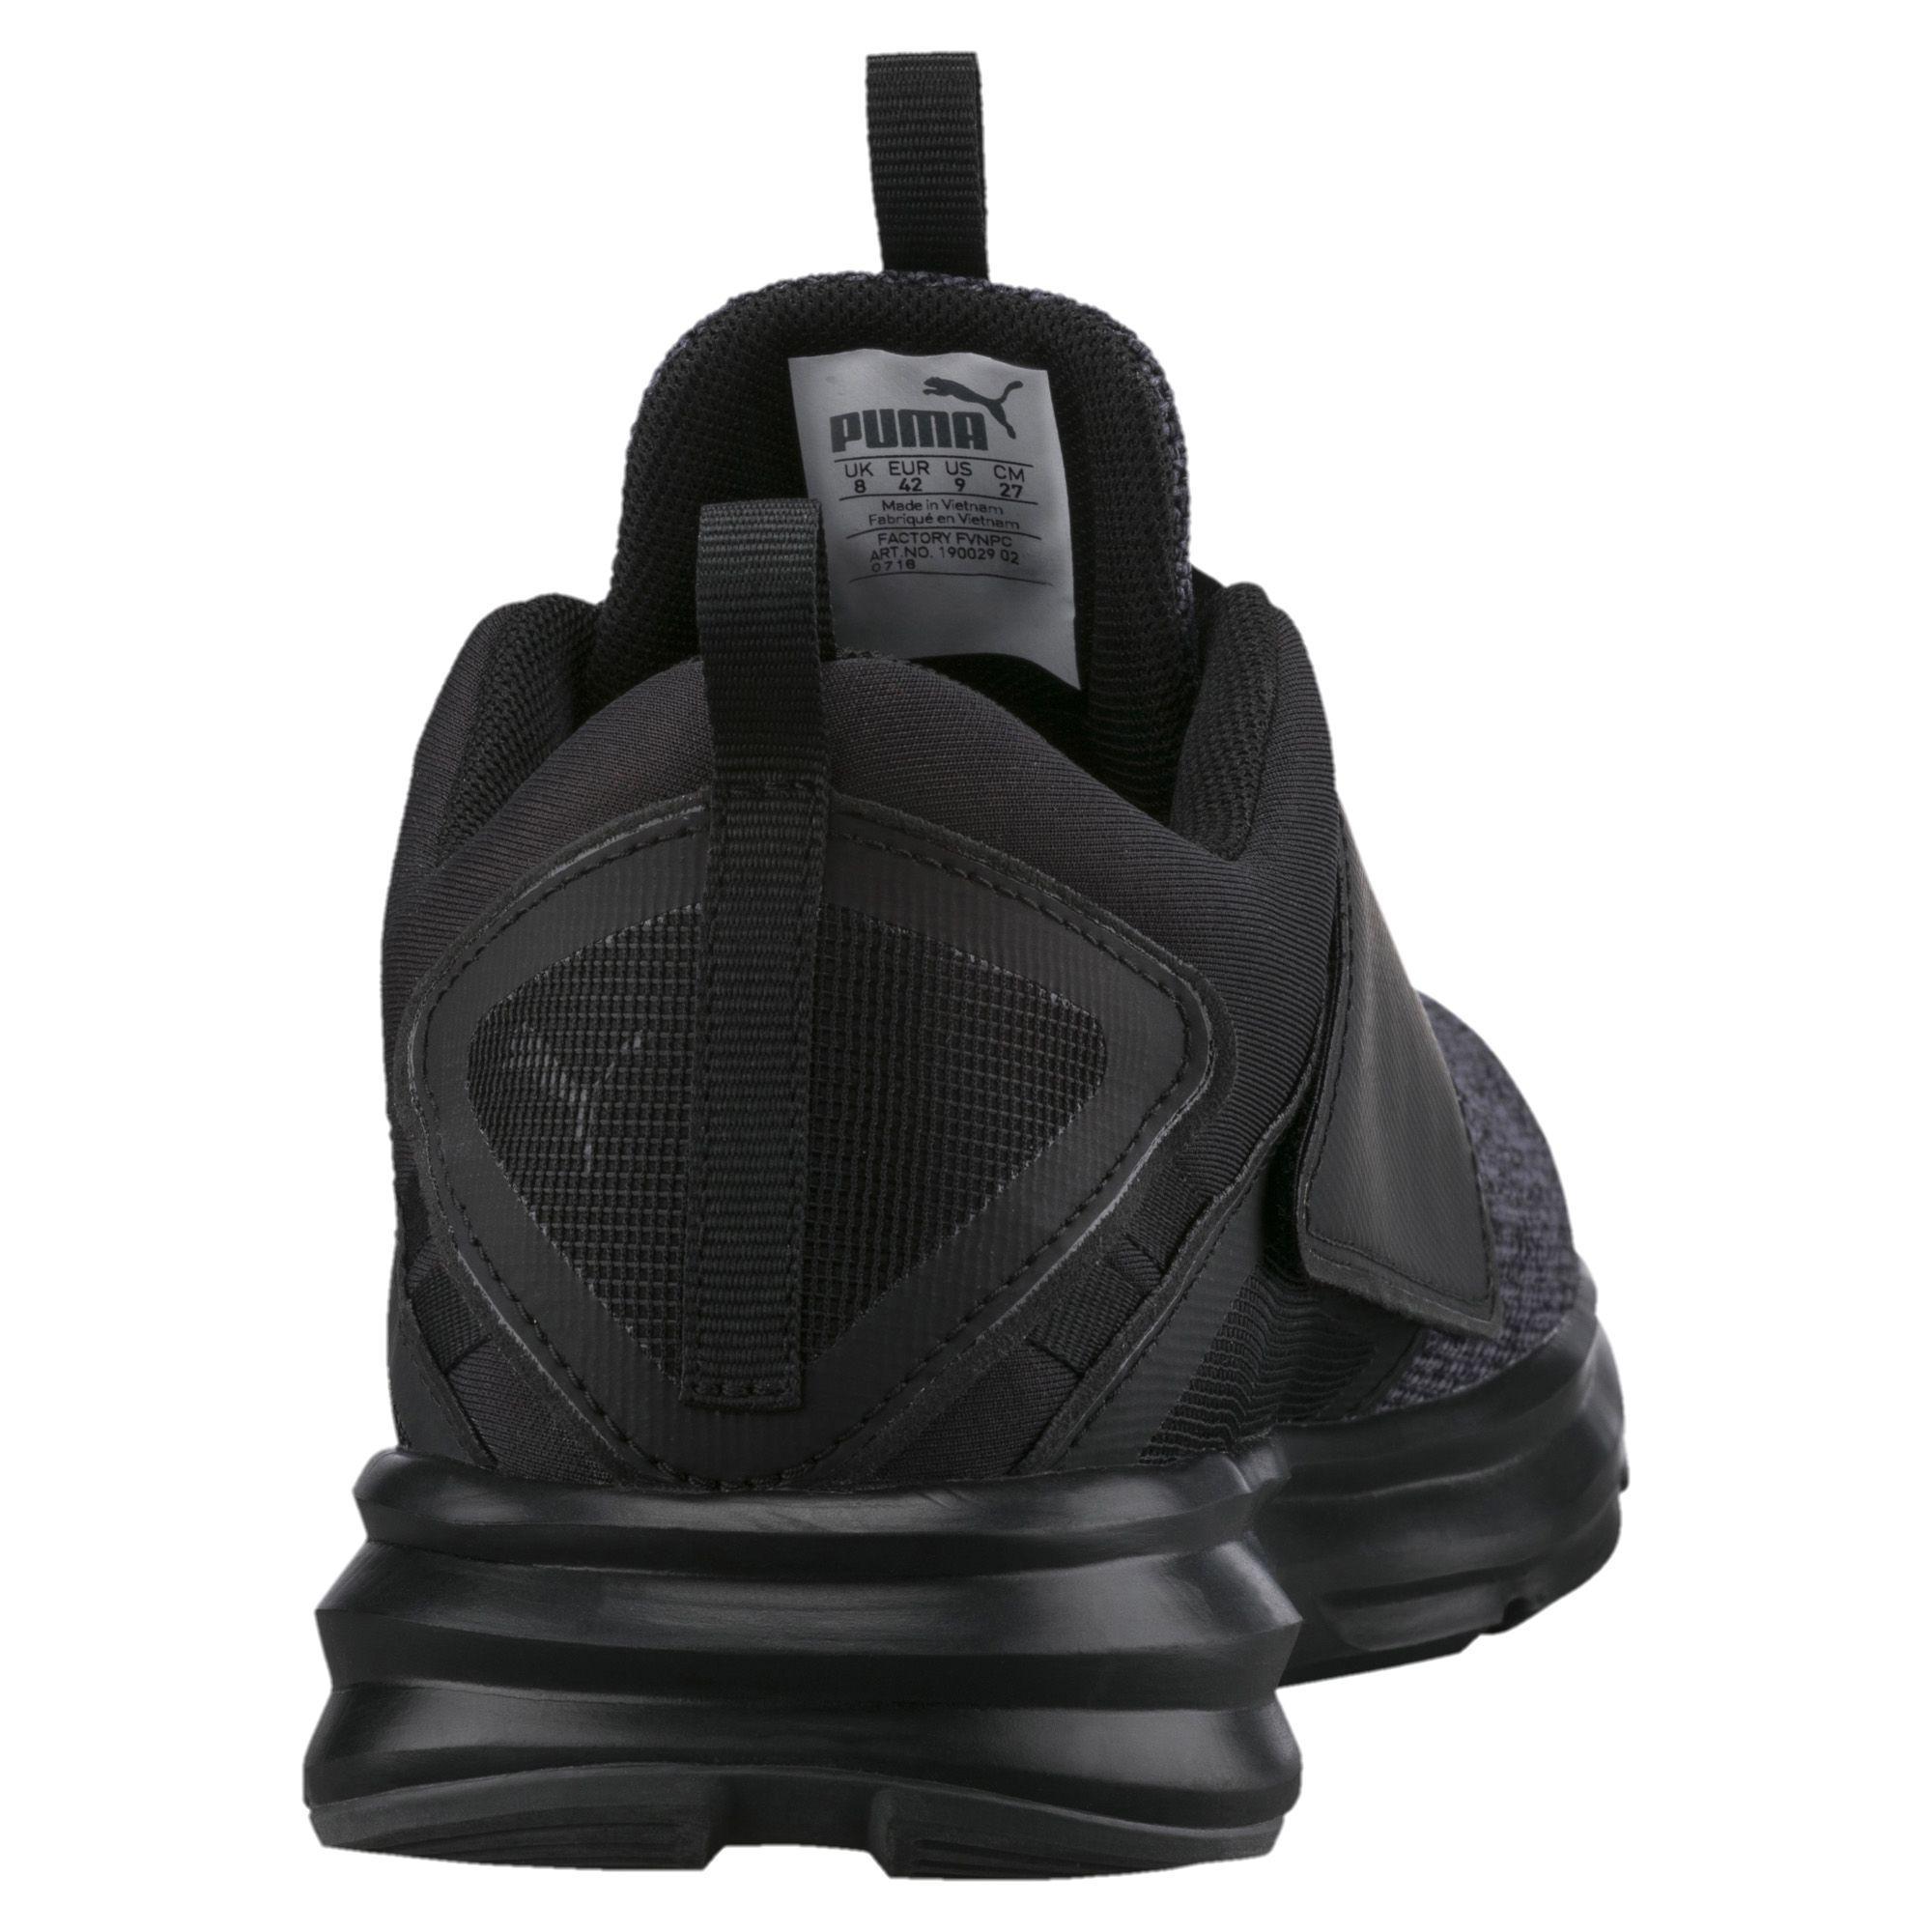 832ece7efcf Lyst - PUMA Enzo Strap Knit Men s Running Shoes in Black for Men